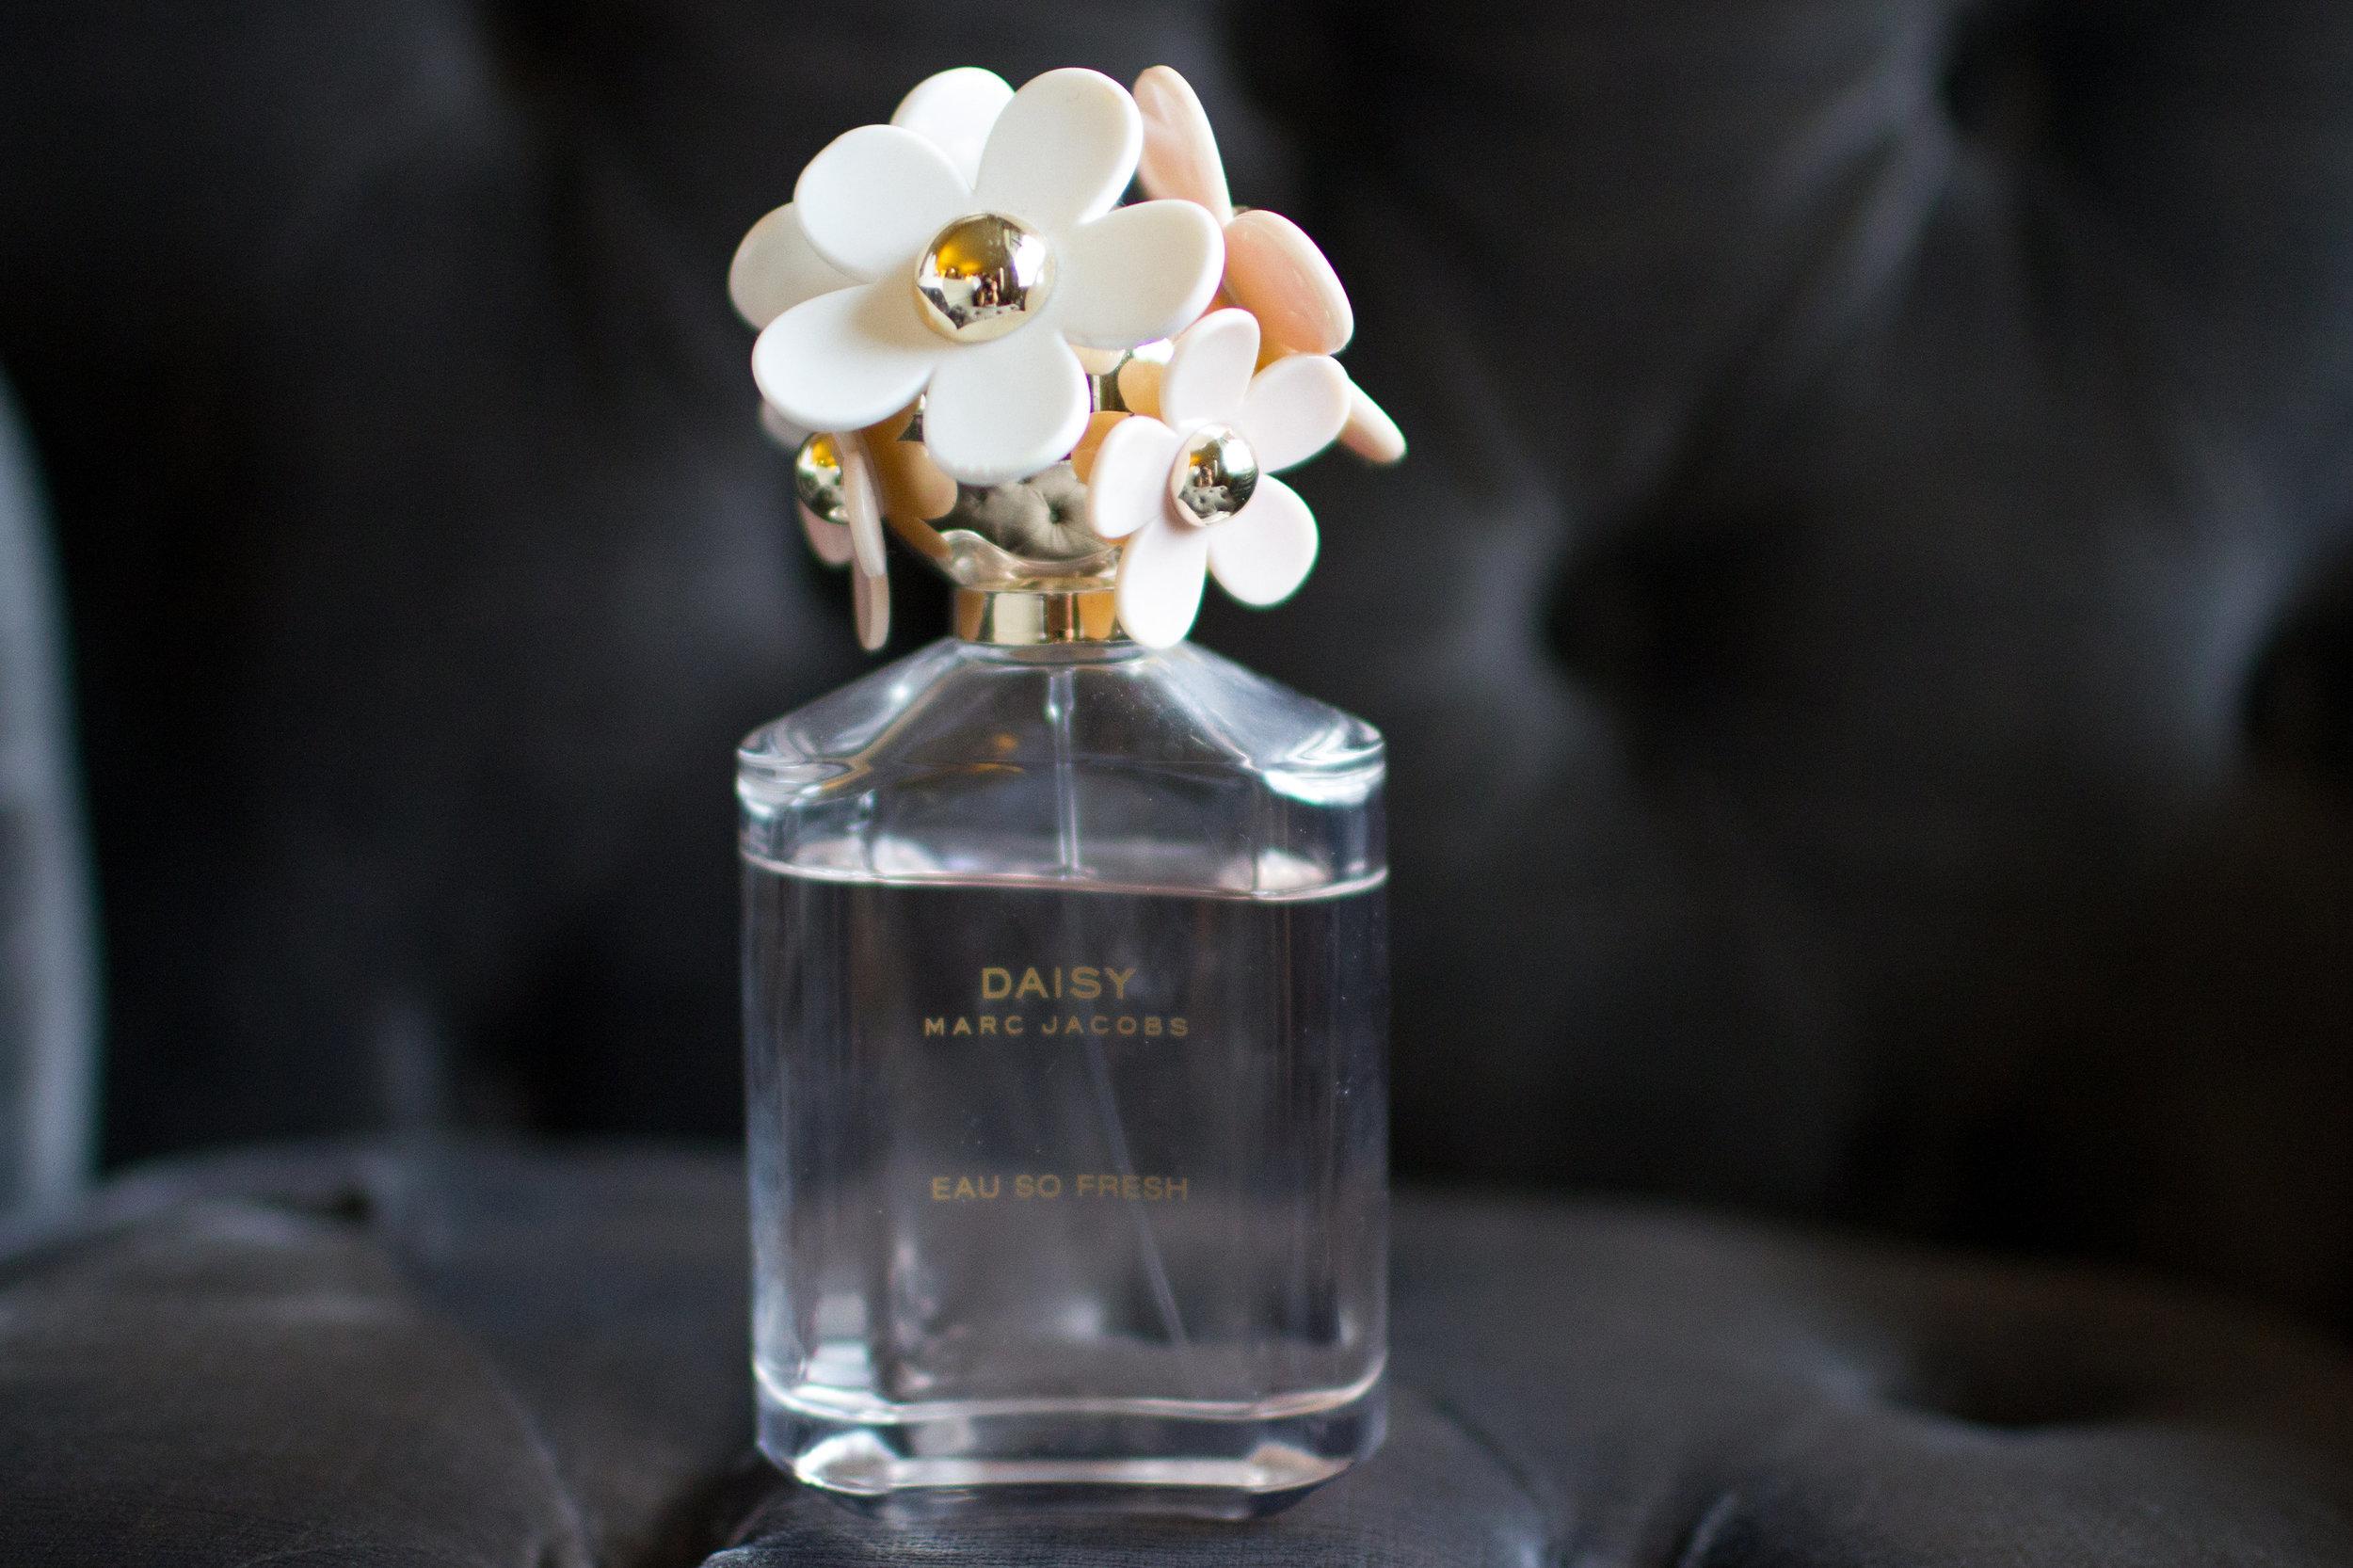 Bridal-Marc-Jacobs-perfume-bottle